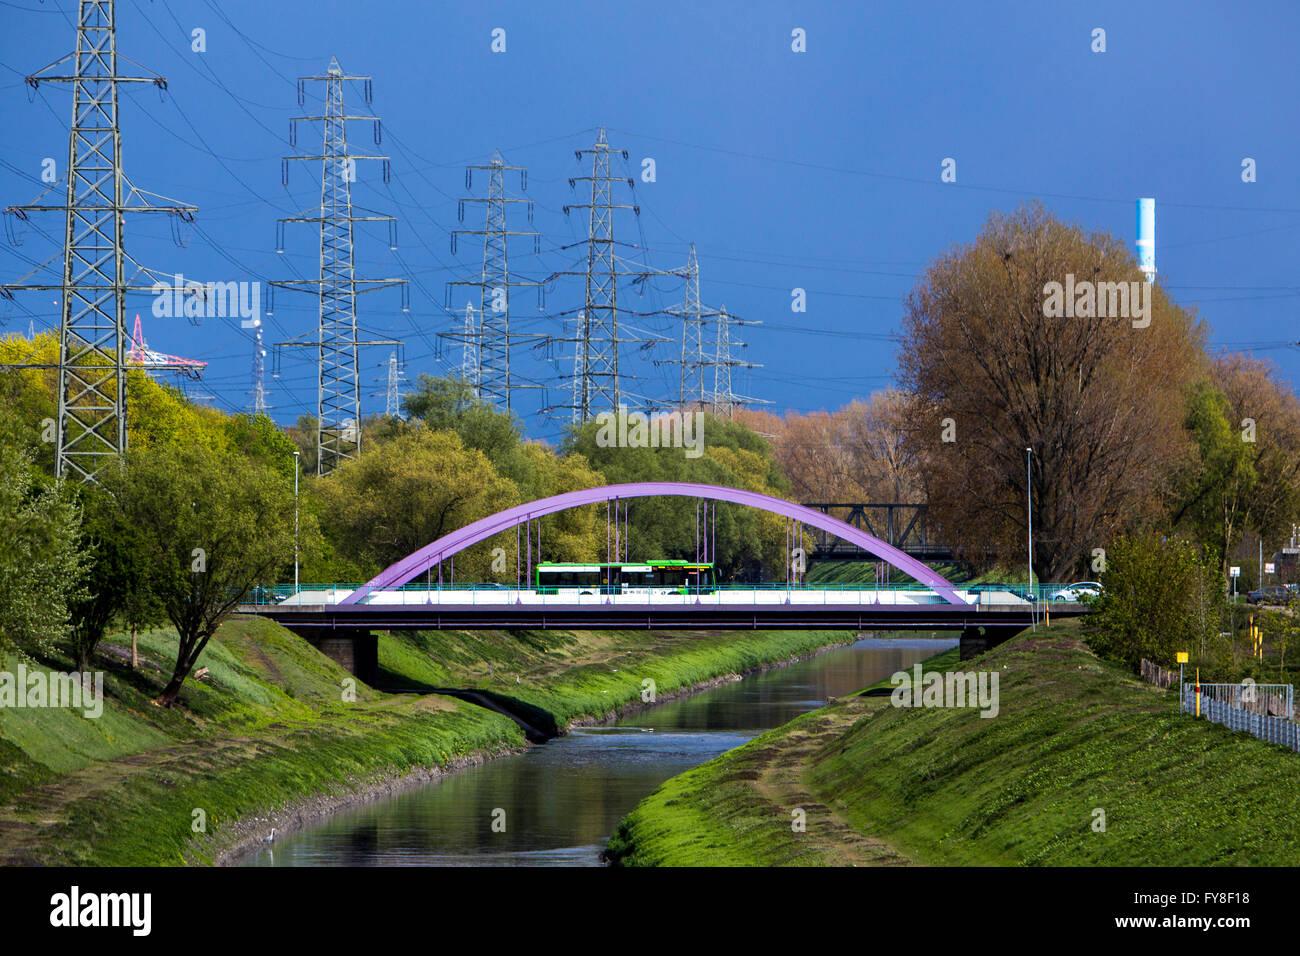 Bridge over river Emscher, in Oberhausen, Germany, dark cloudy sky, high wire electrical power lines, - Stock Image